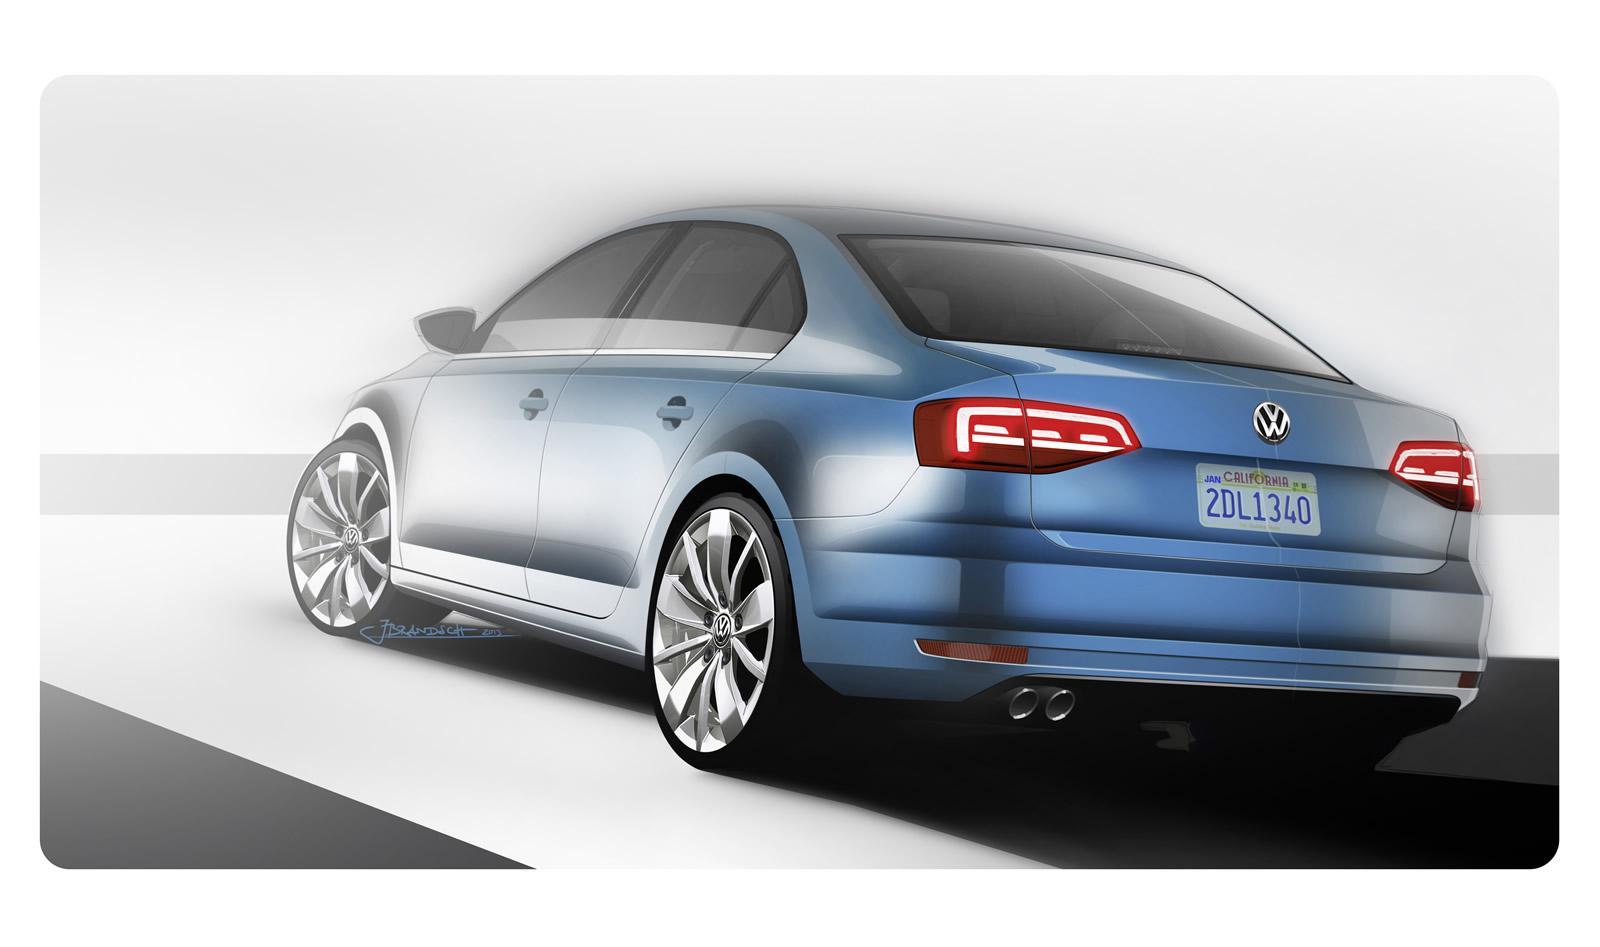 2015 Volkswagen Jetta Revealed: Cosmetic Tweaks and New TDI